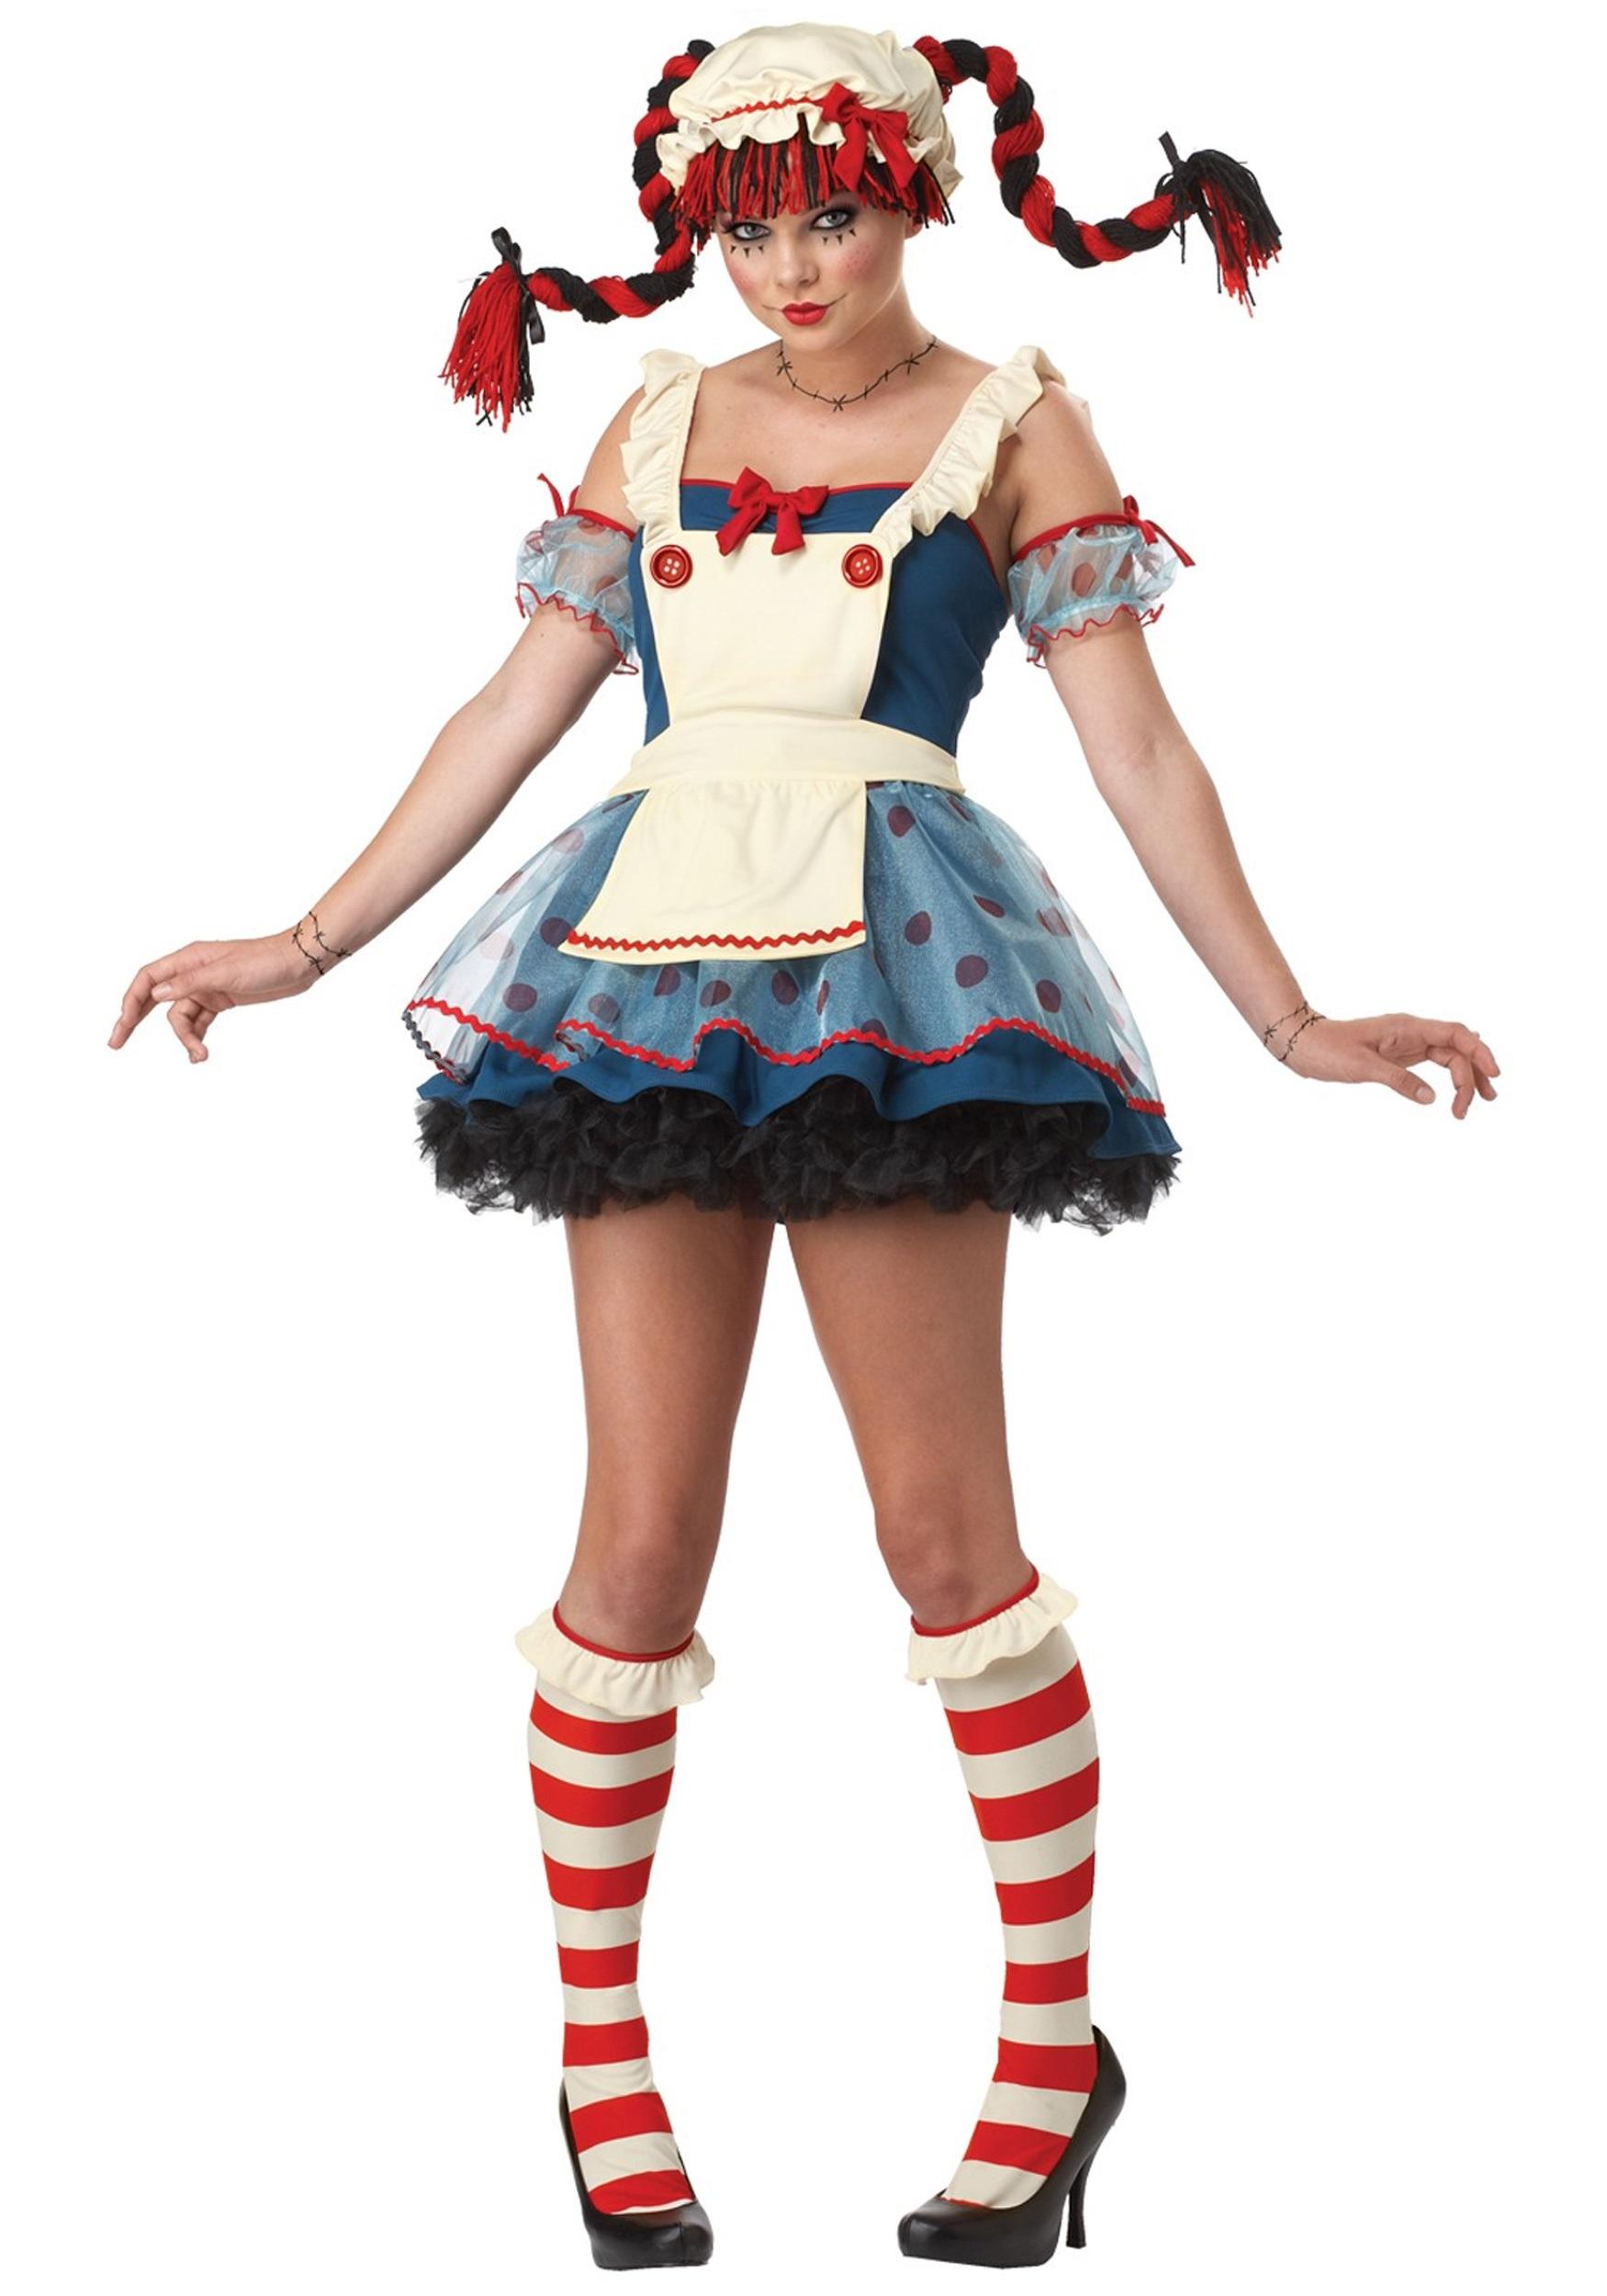 sassy teen rag doll costume